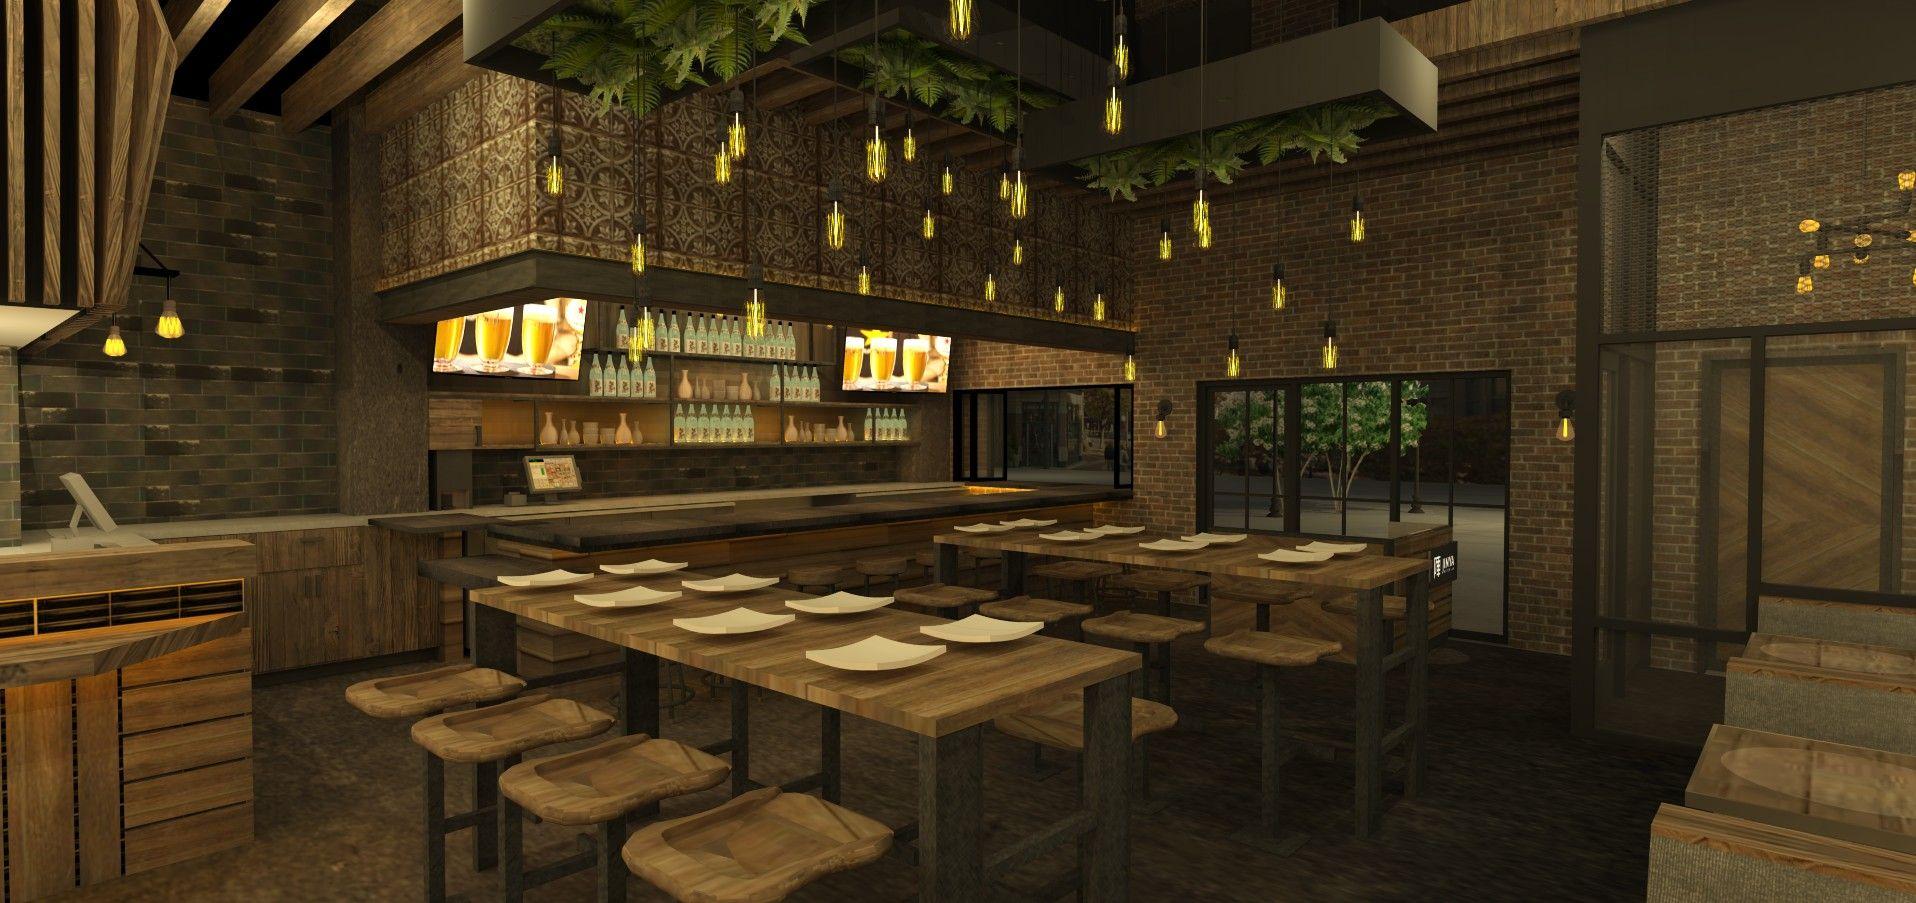 JINYA Ramen Bar's Expansion in the DC Metropolitan Area Continues